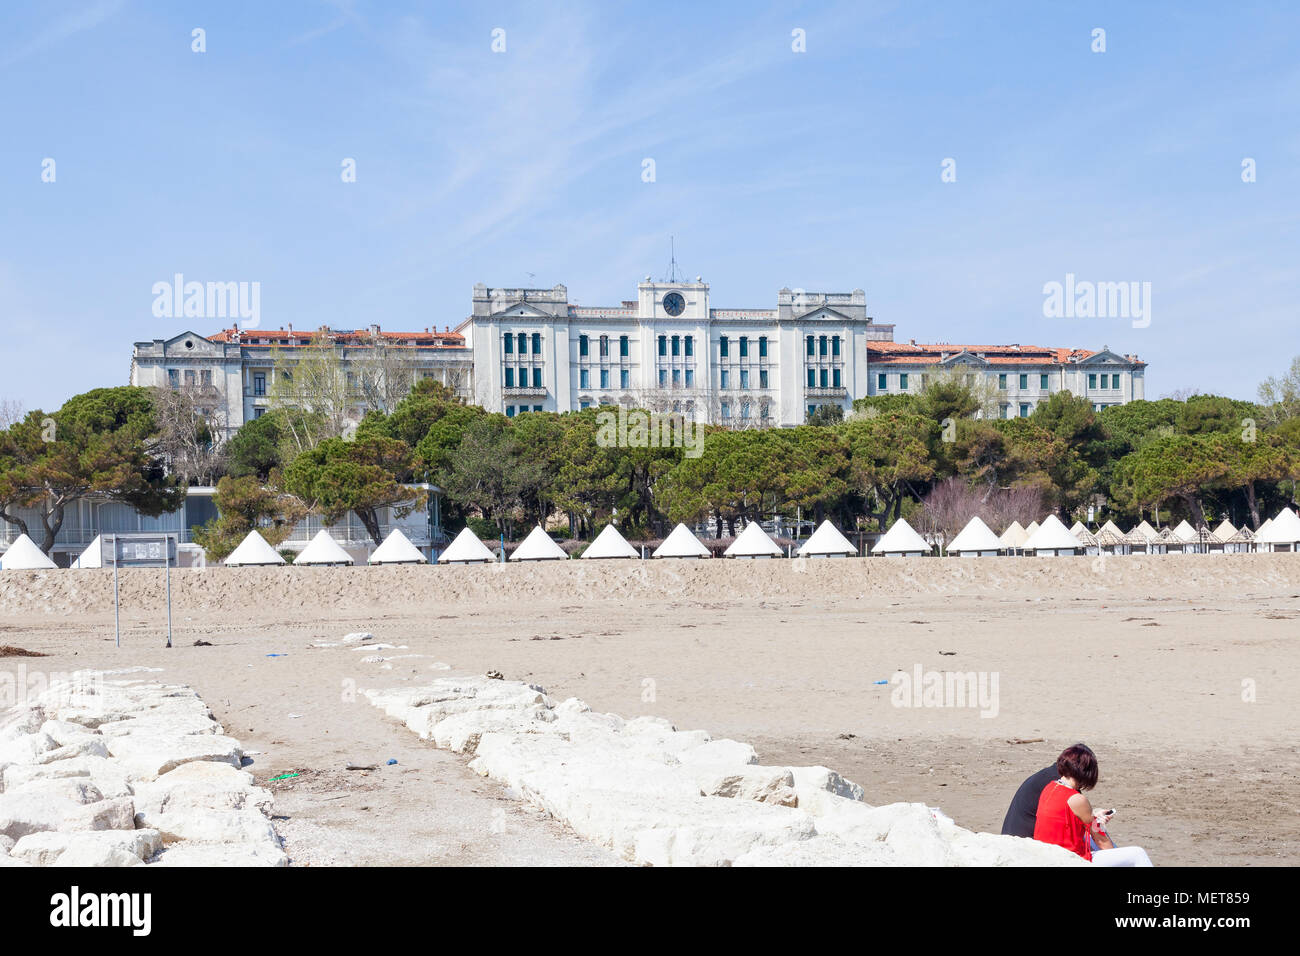 Hotel Des Bains Lido Di Venezia